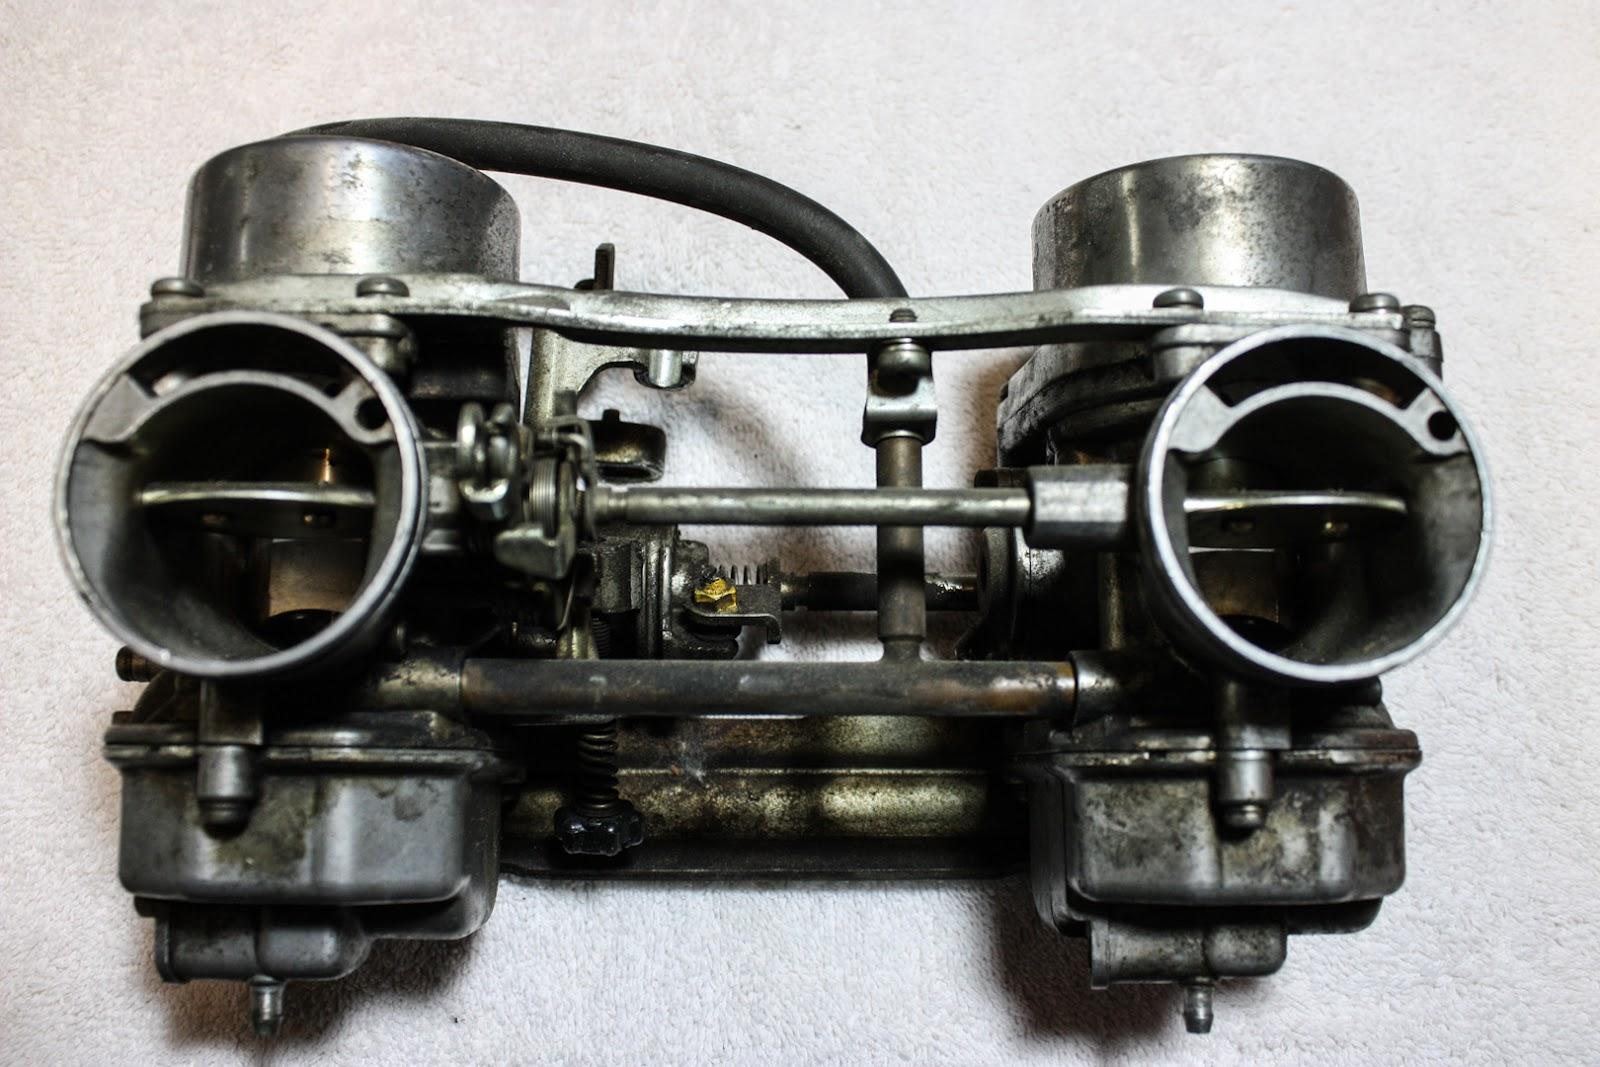 Cx500 Carburetor Diagram Agcrewall Honda Motorcycle Carb Diagrams Carbs Html